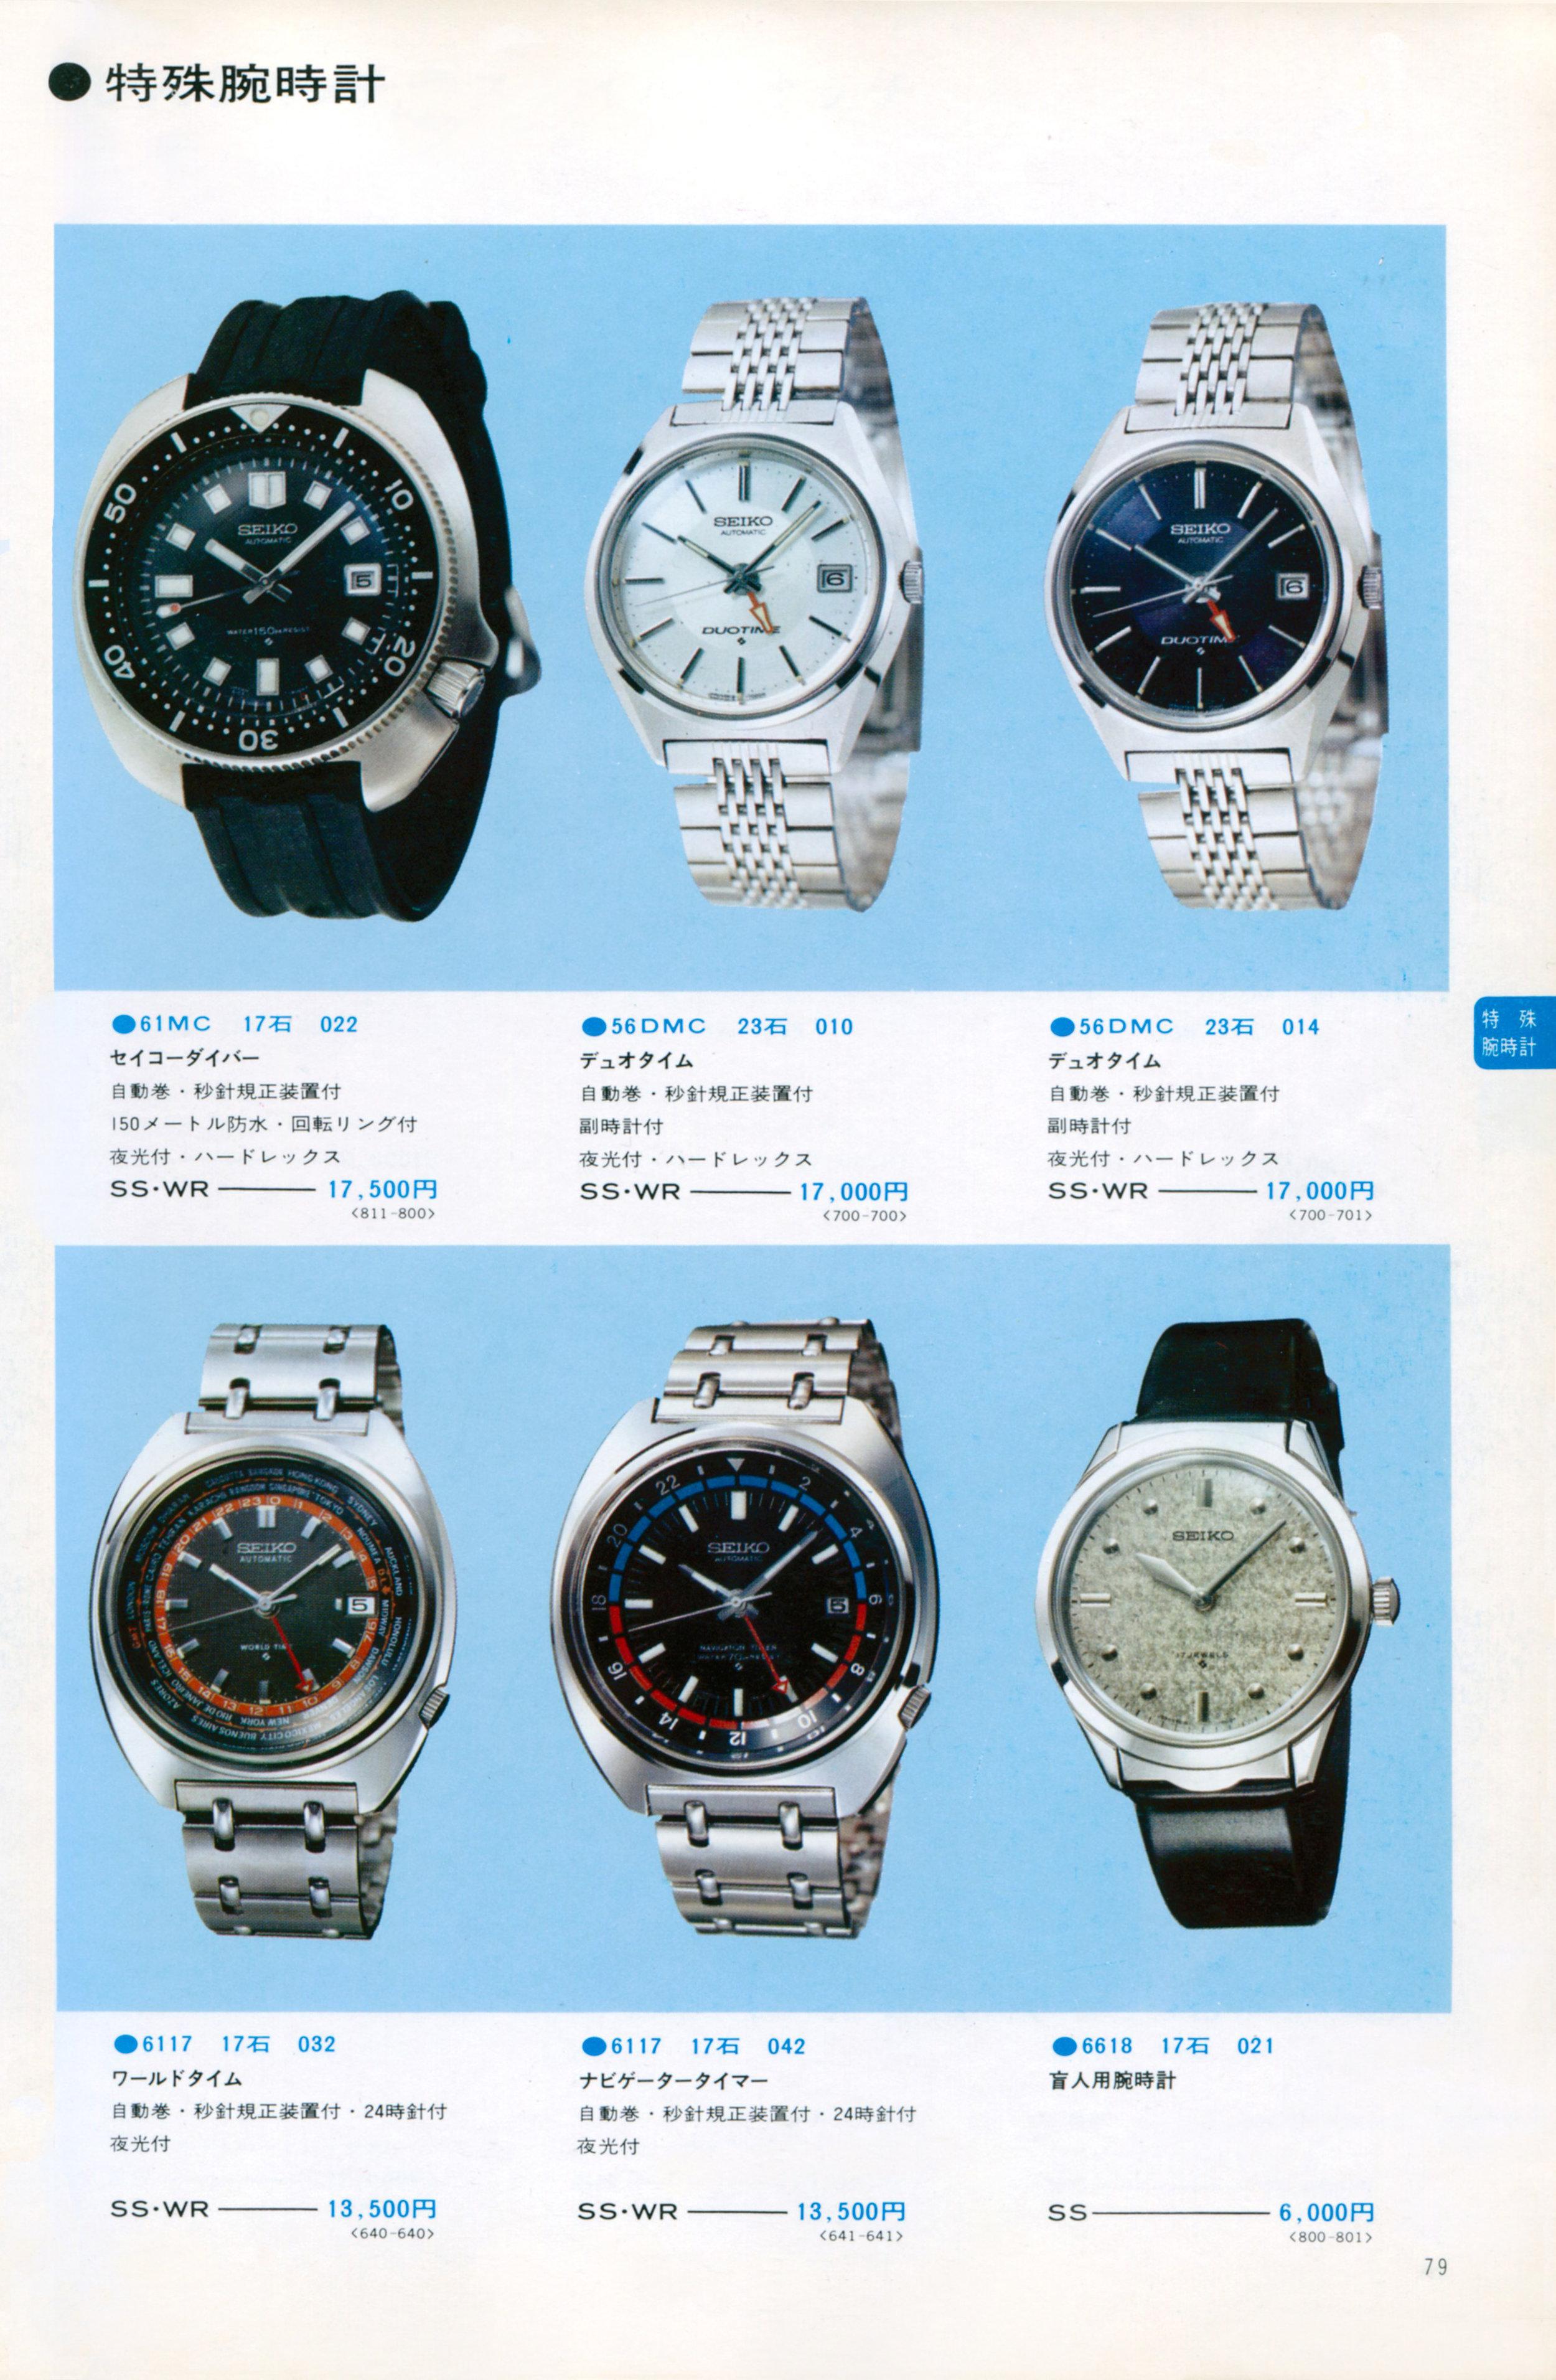 1974 Vol.1 Seiko JDM Catalog